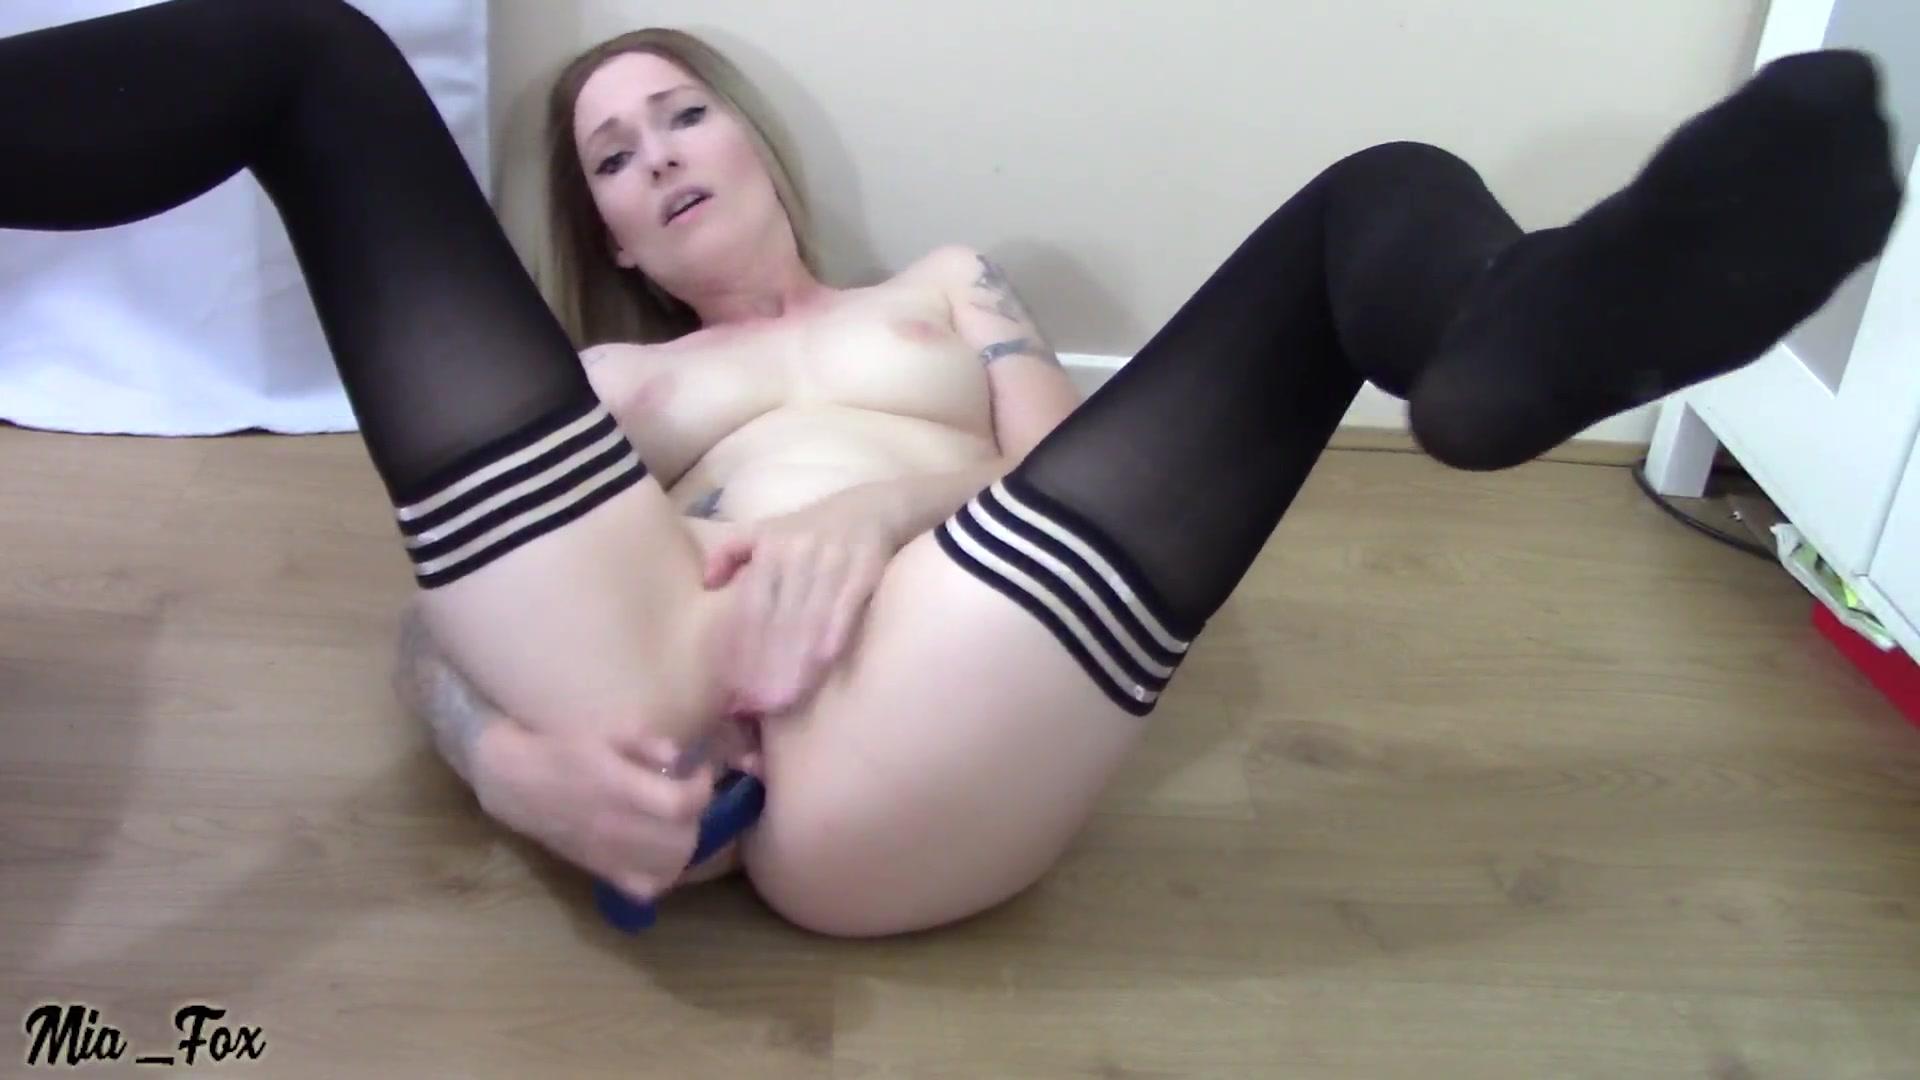 2 amateur girls share dick on webcam